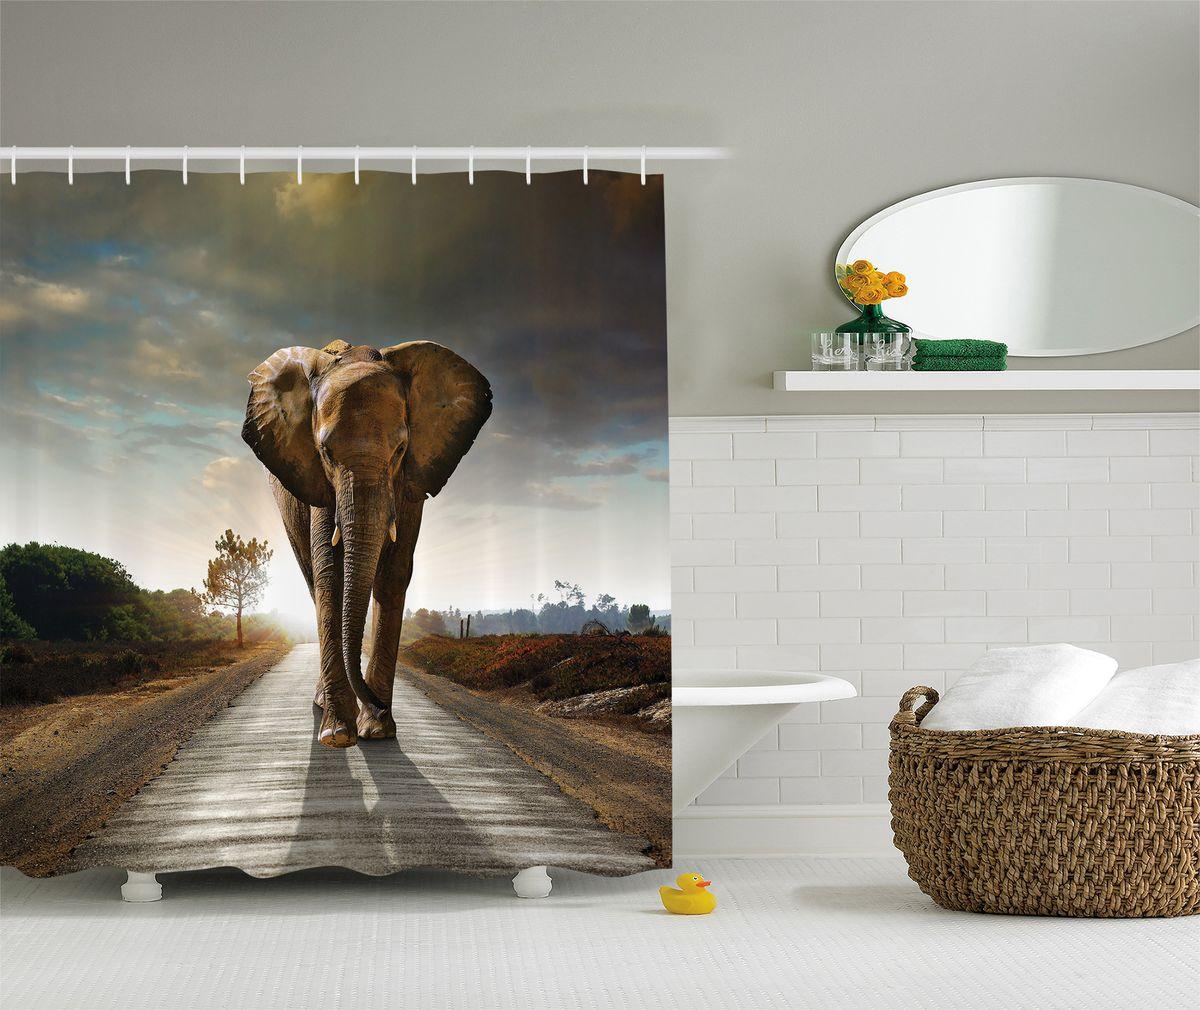 Штора для ванной комнаты Magic Lady Слон на пустынной дороге, 180 х 200 см